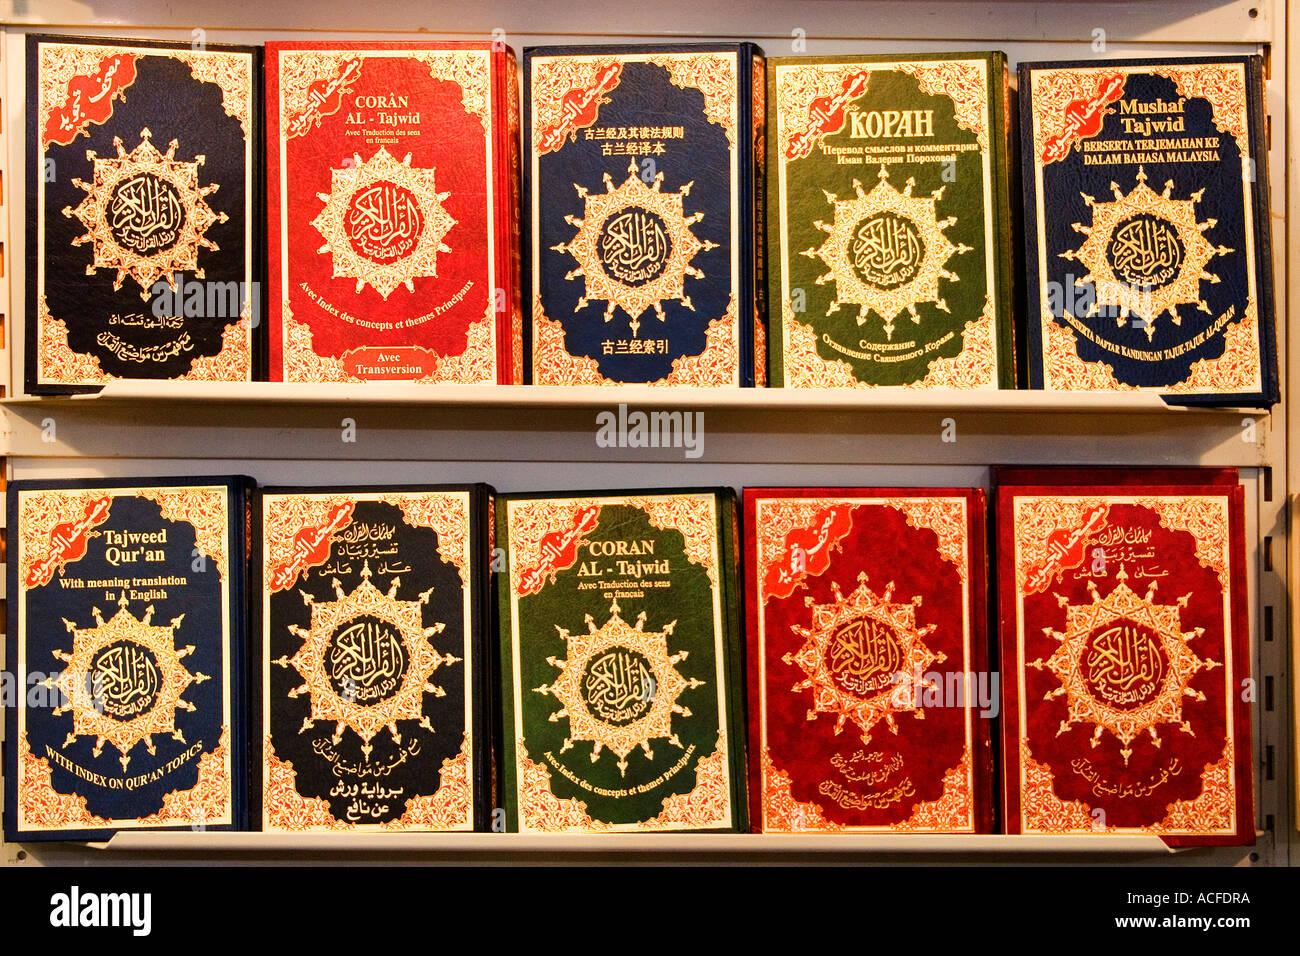 DEU Frankfurt Bookfair  transliteration stall from Damaskus Koran books - Stock Image